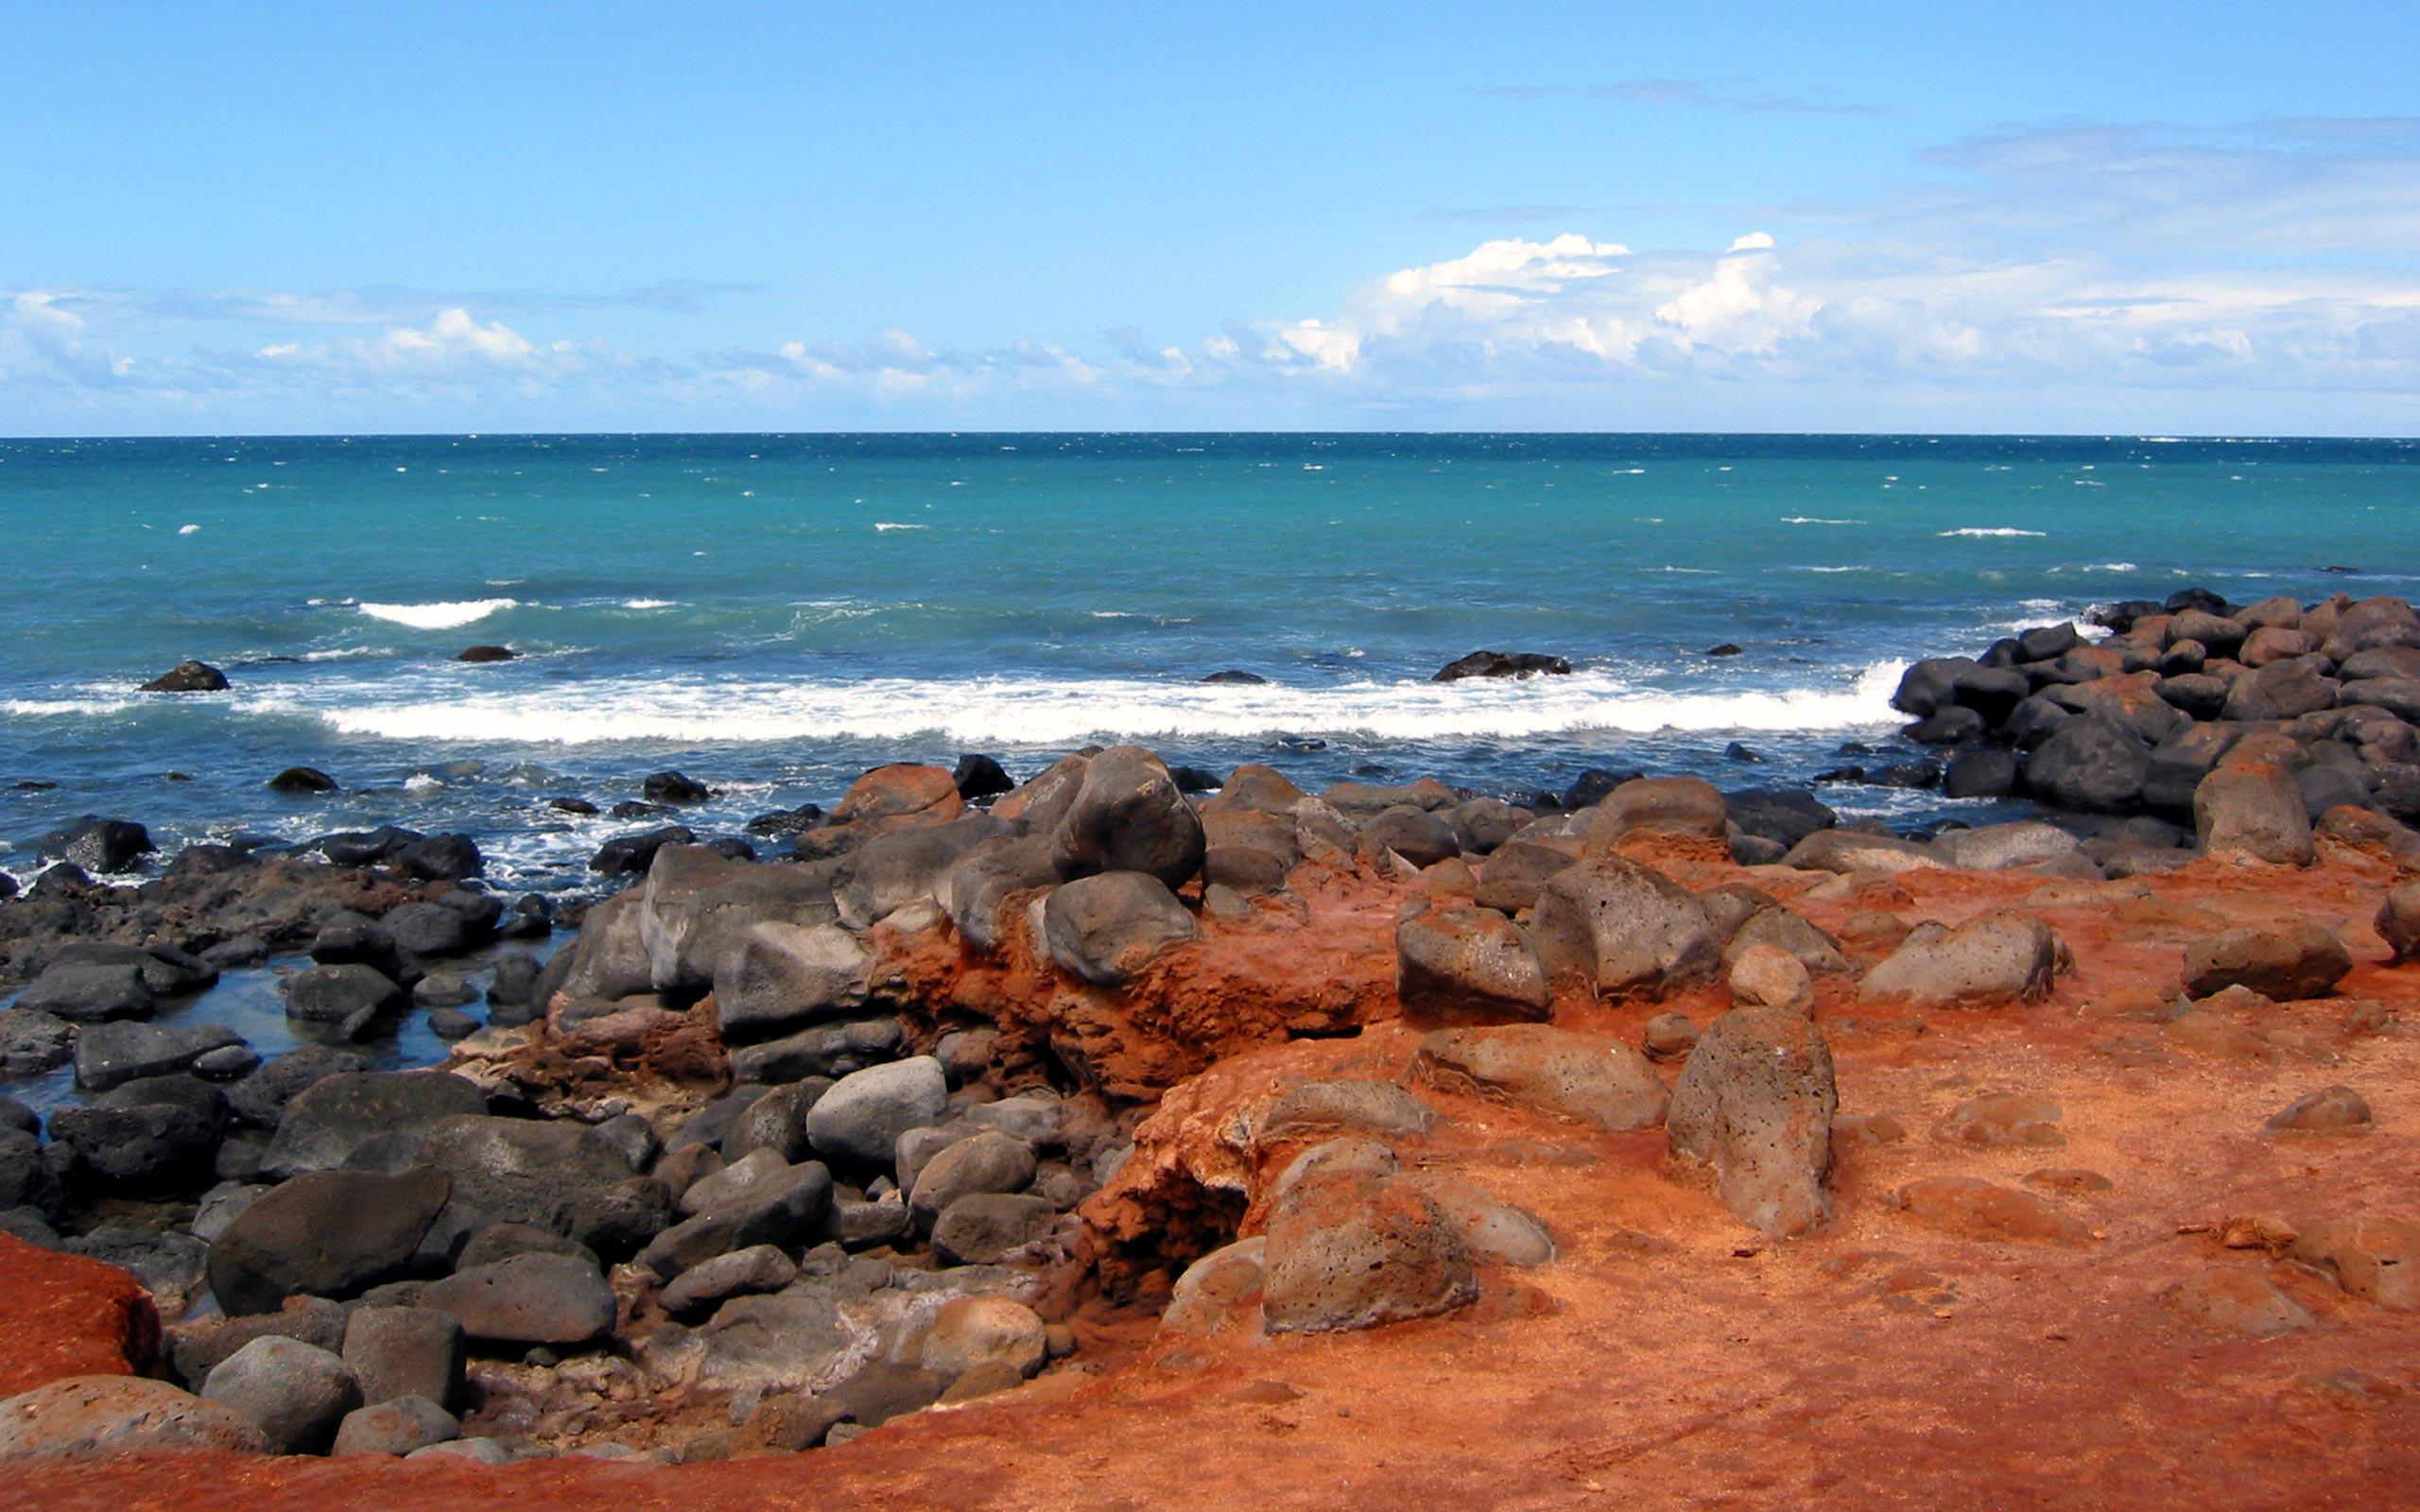 Камни, море, остров, гордок бесплатно